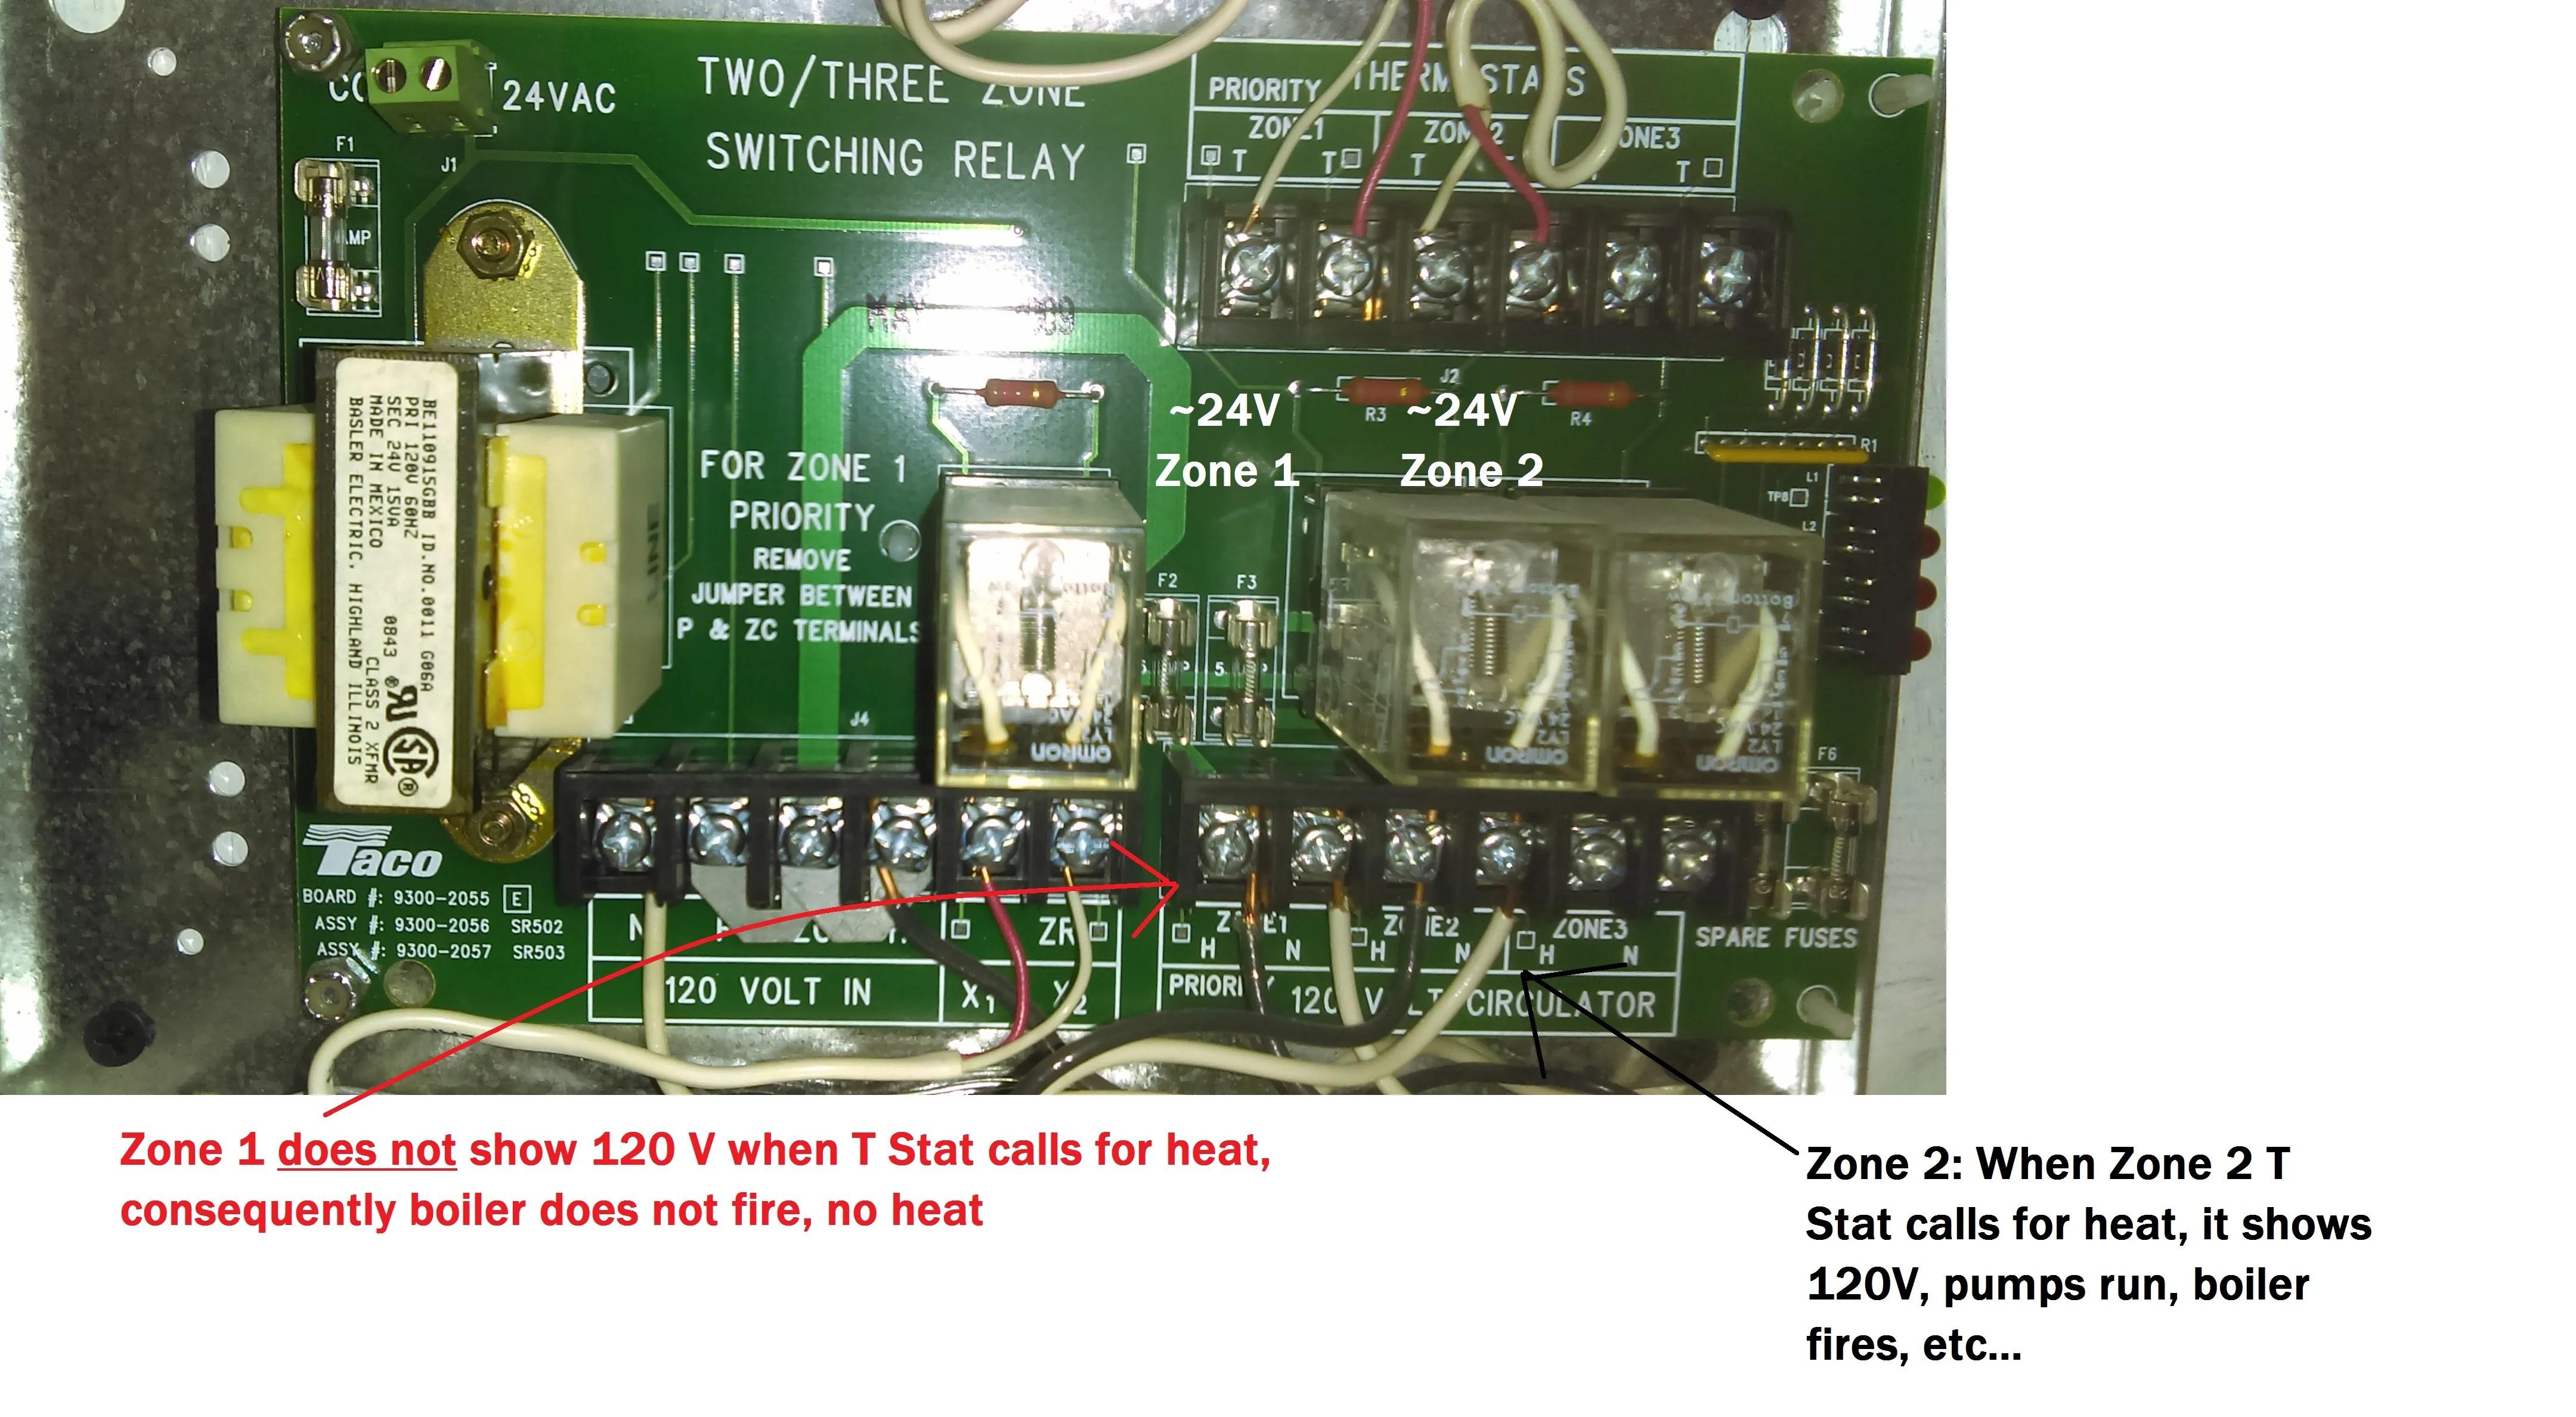 Taco Sr502 Wiring Diagram 4 | Wiring Diagram